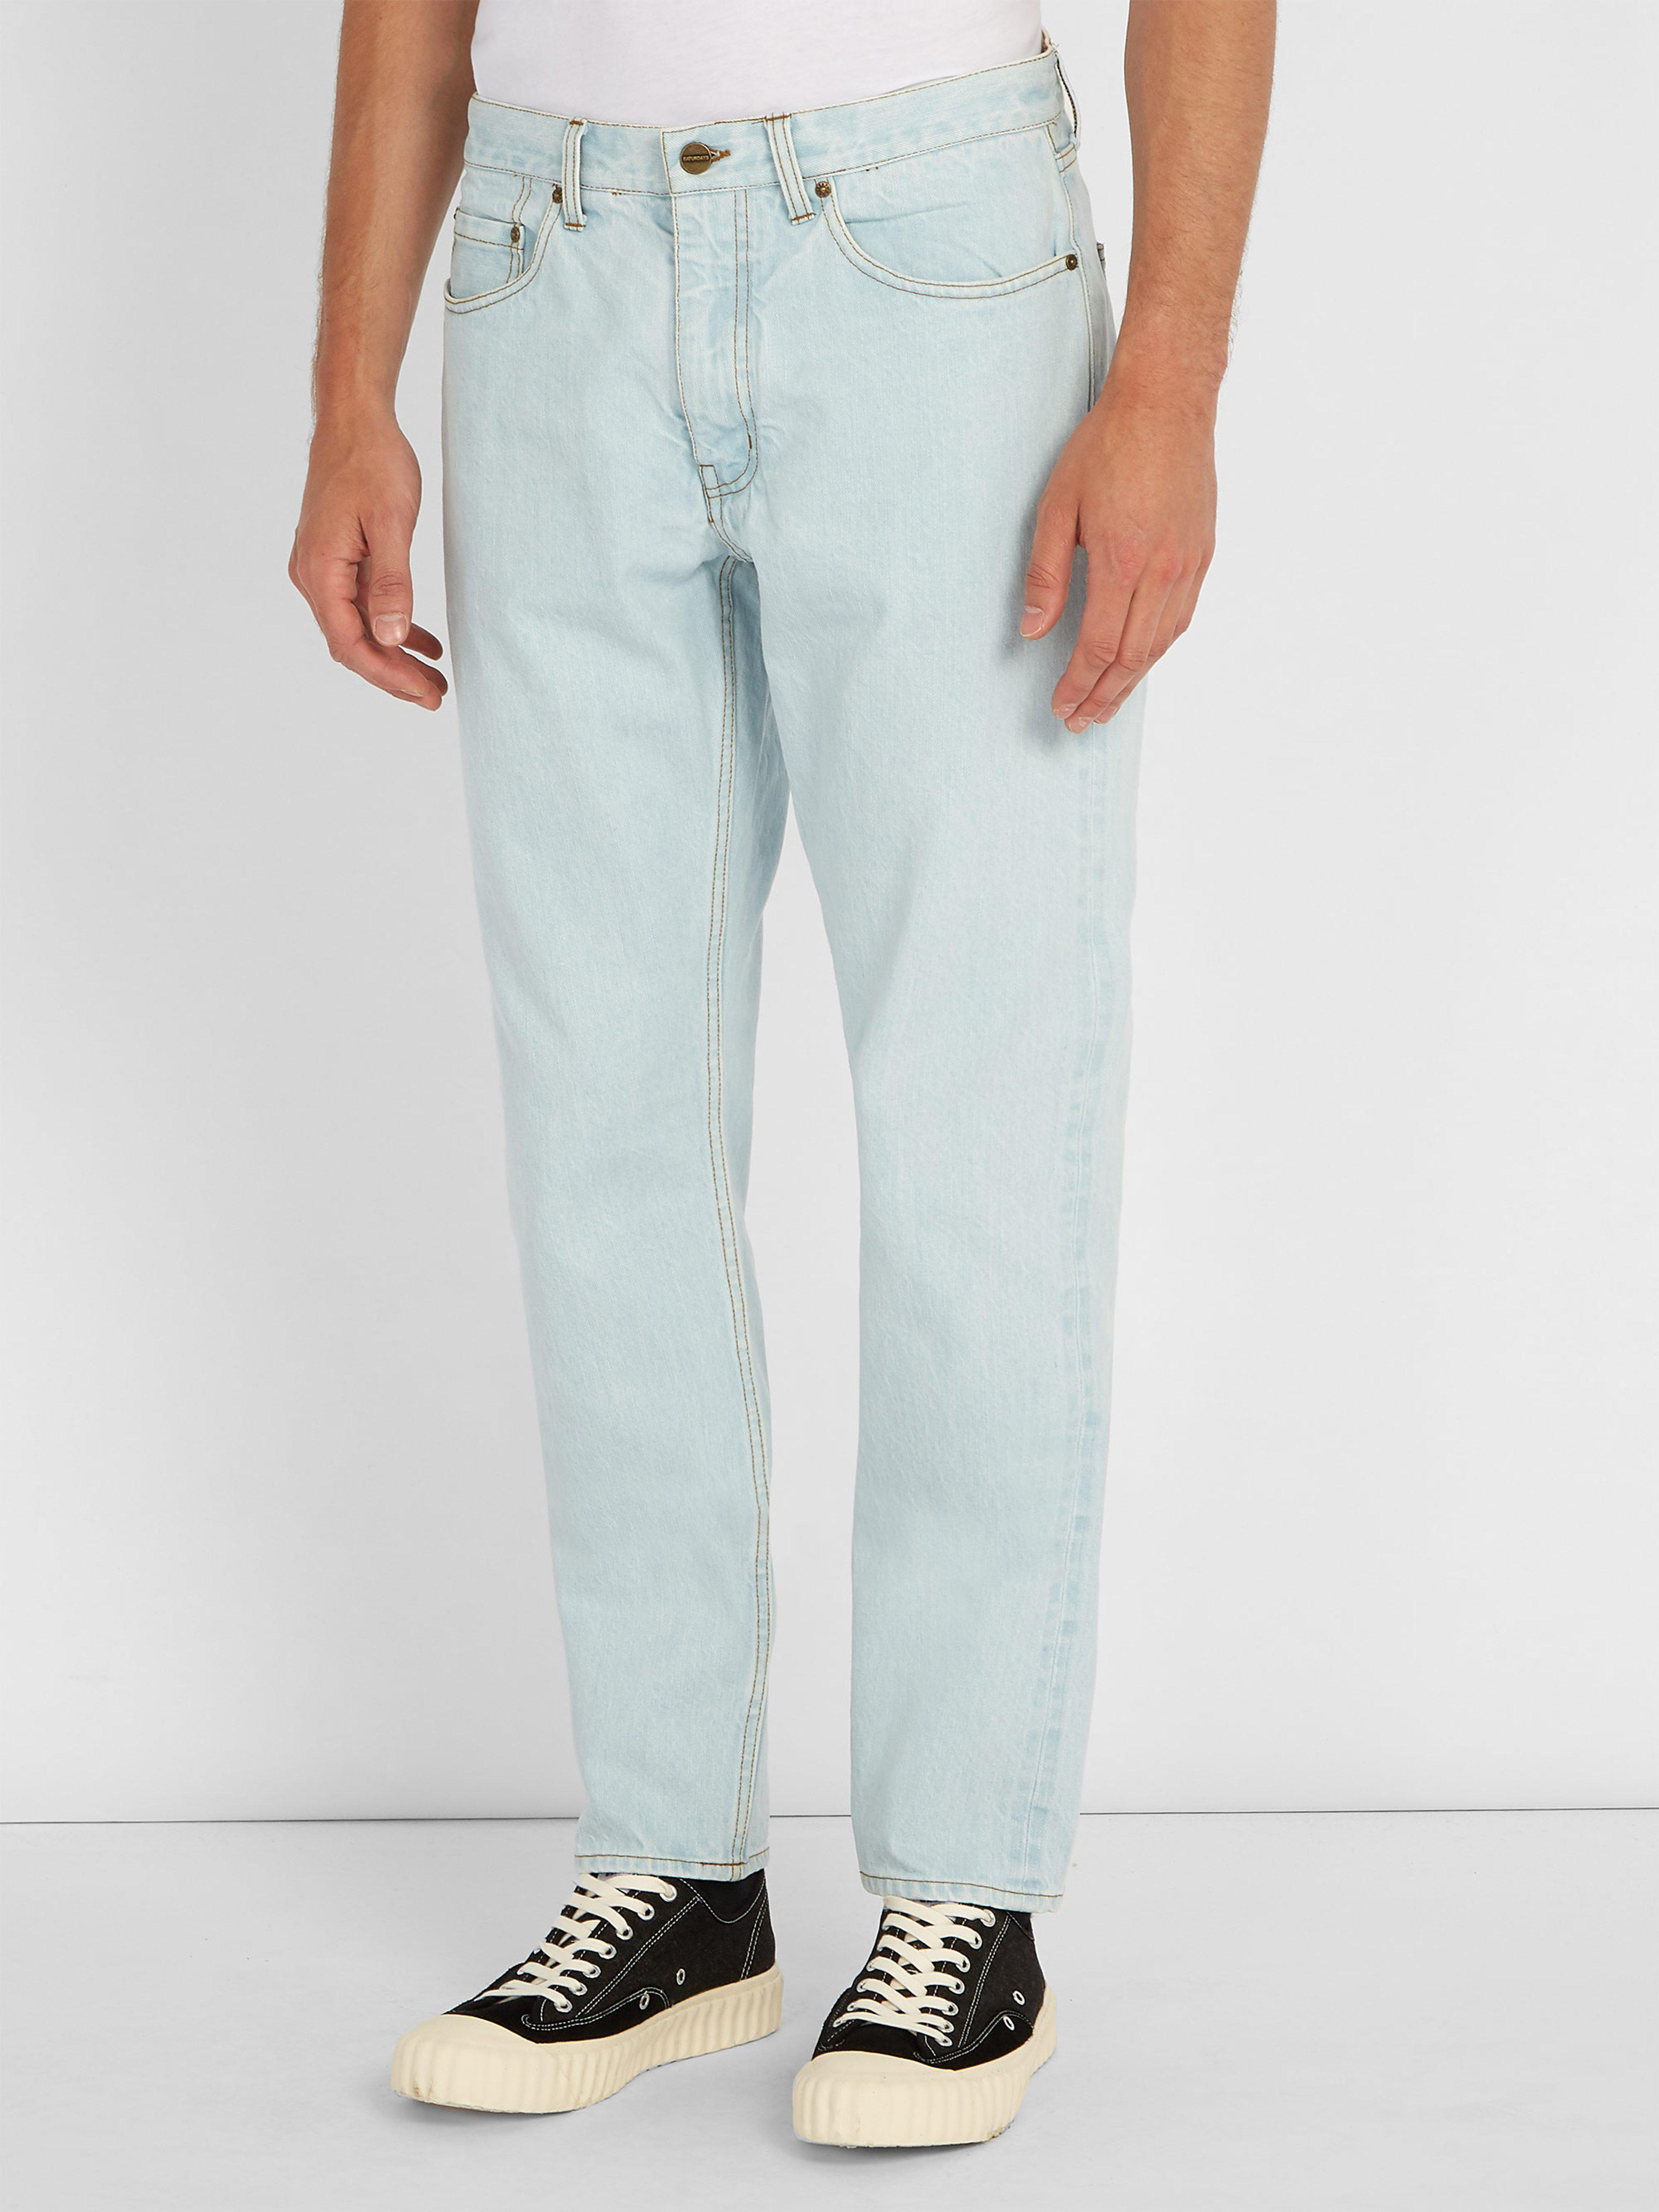 Saturdays NYC Luke Straight Leg Denim Jeans in Blue for Men